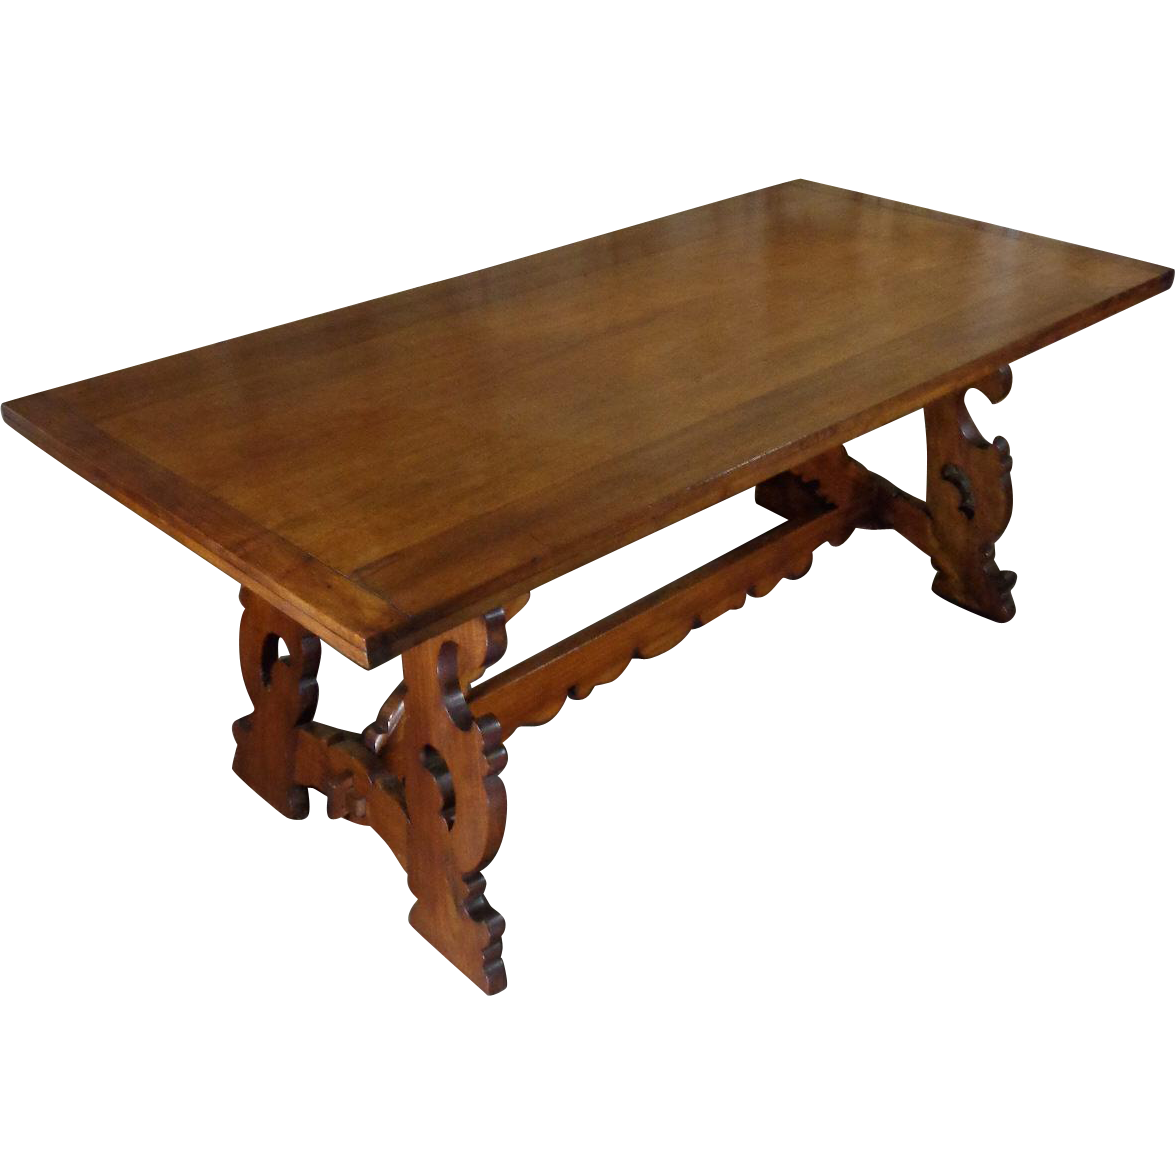 Italian Walnut Dining Table 19th Century Antique Italian Walnut Dining Table From